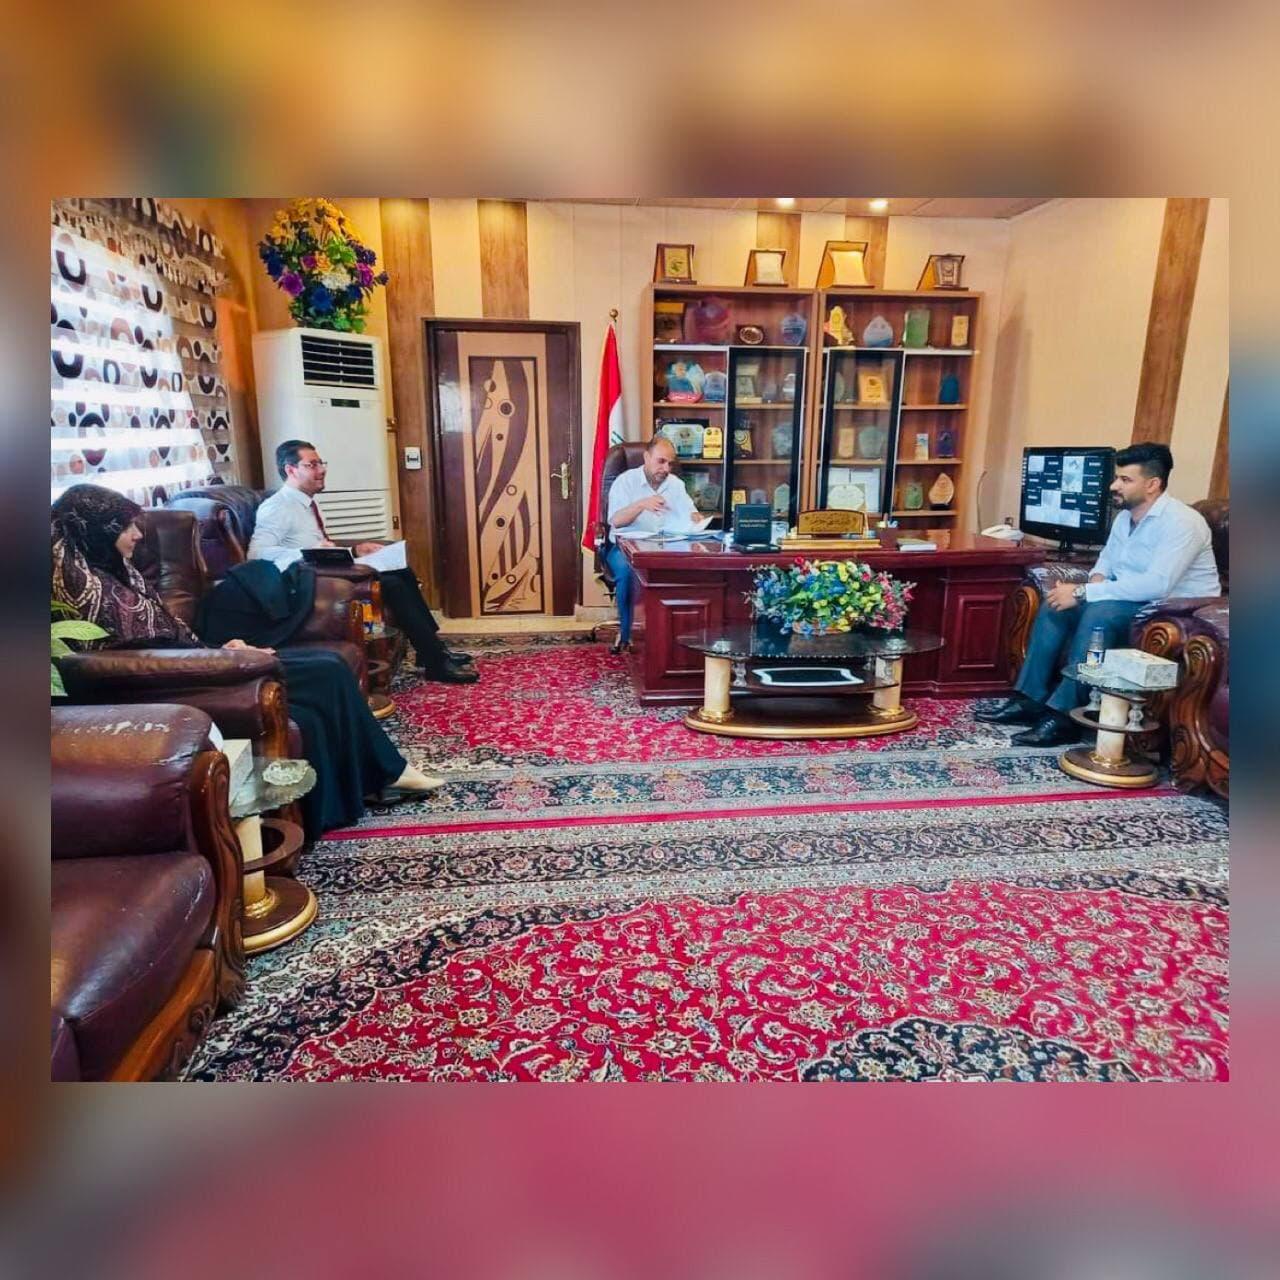 Read more about the article مشاركة تدريسي من جامعة كربلاء في عضوية اختيار الهيئة الاستشارية للشباب